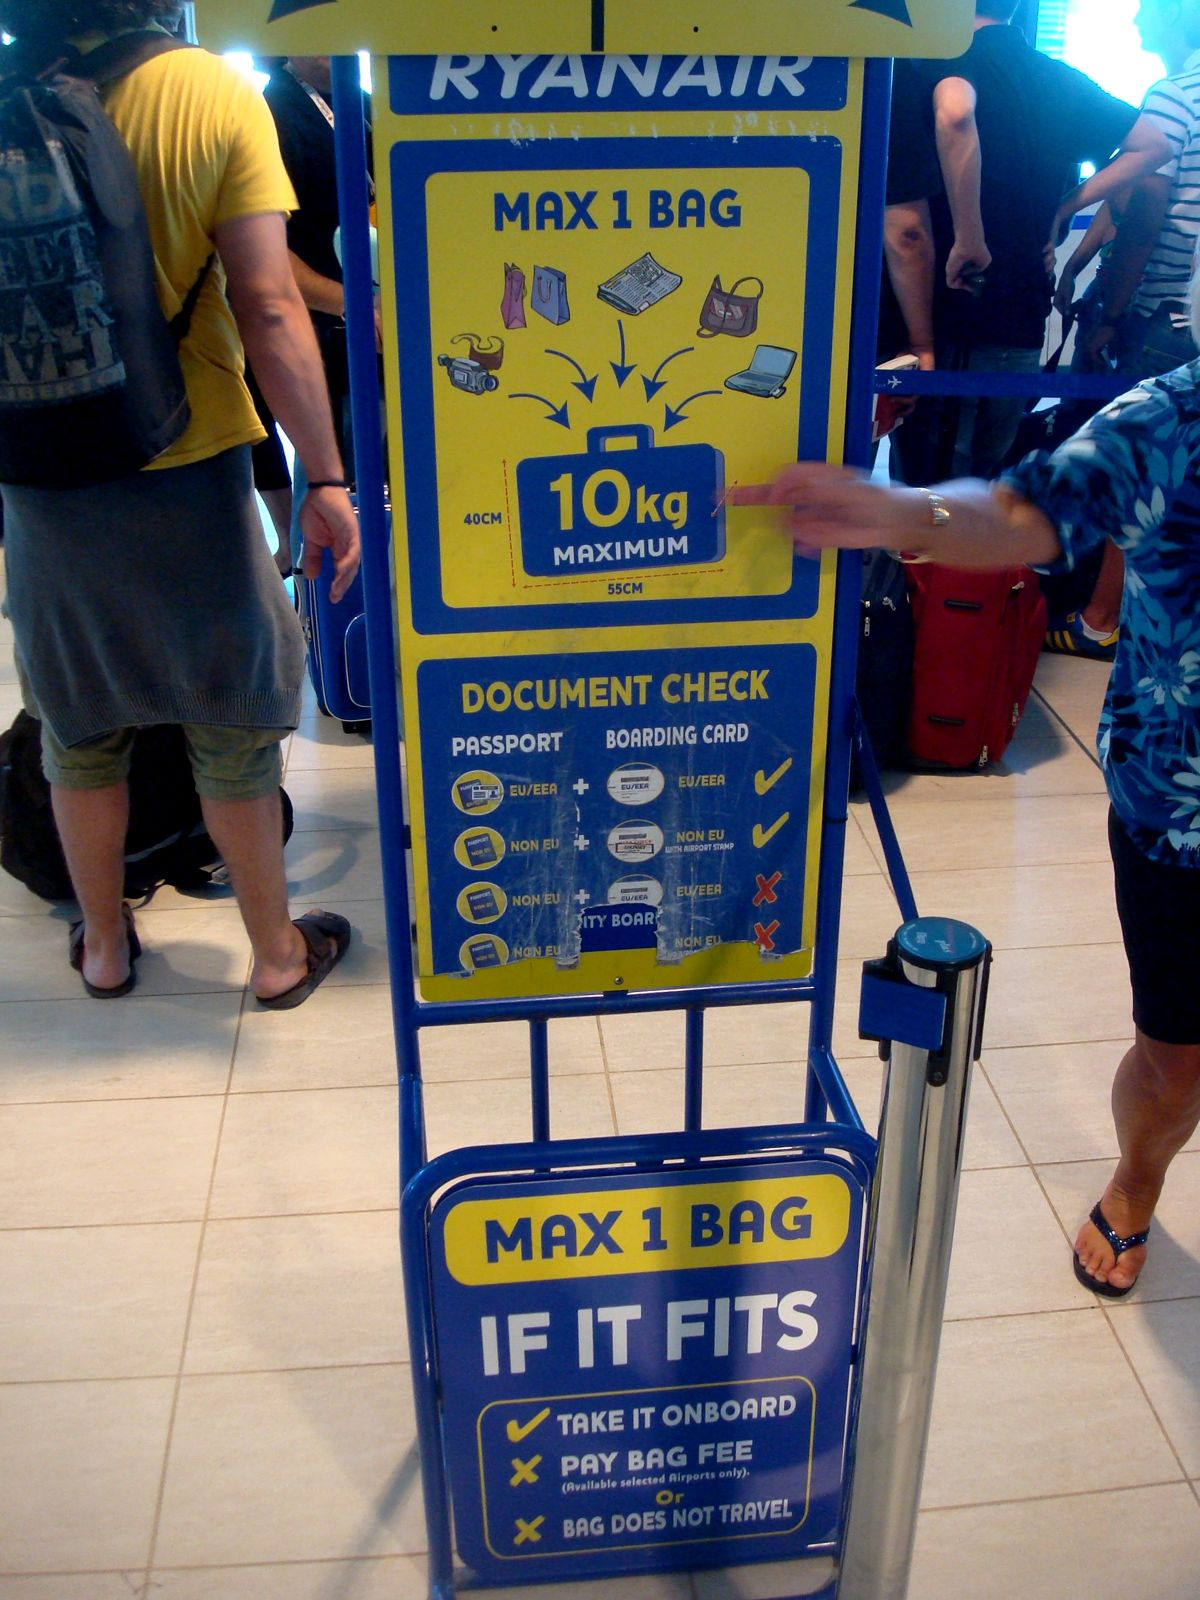 Ryanair+Bag+Check.jpg